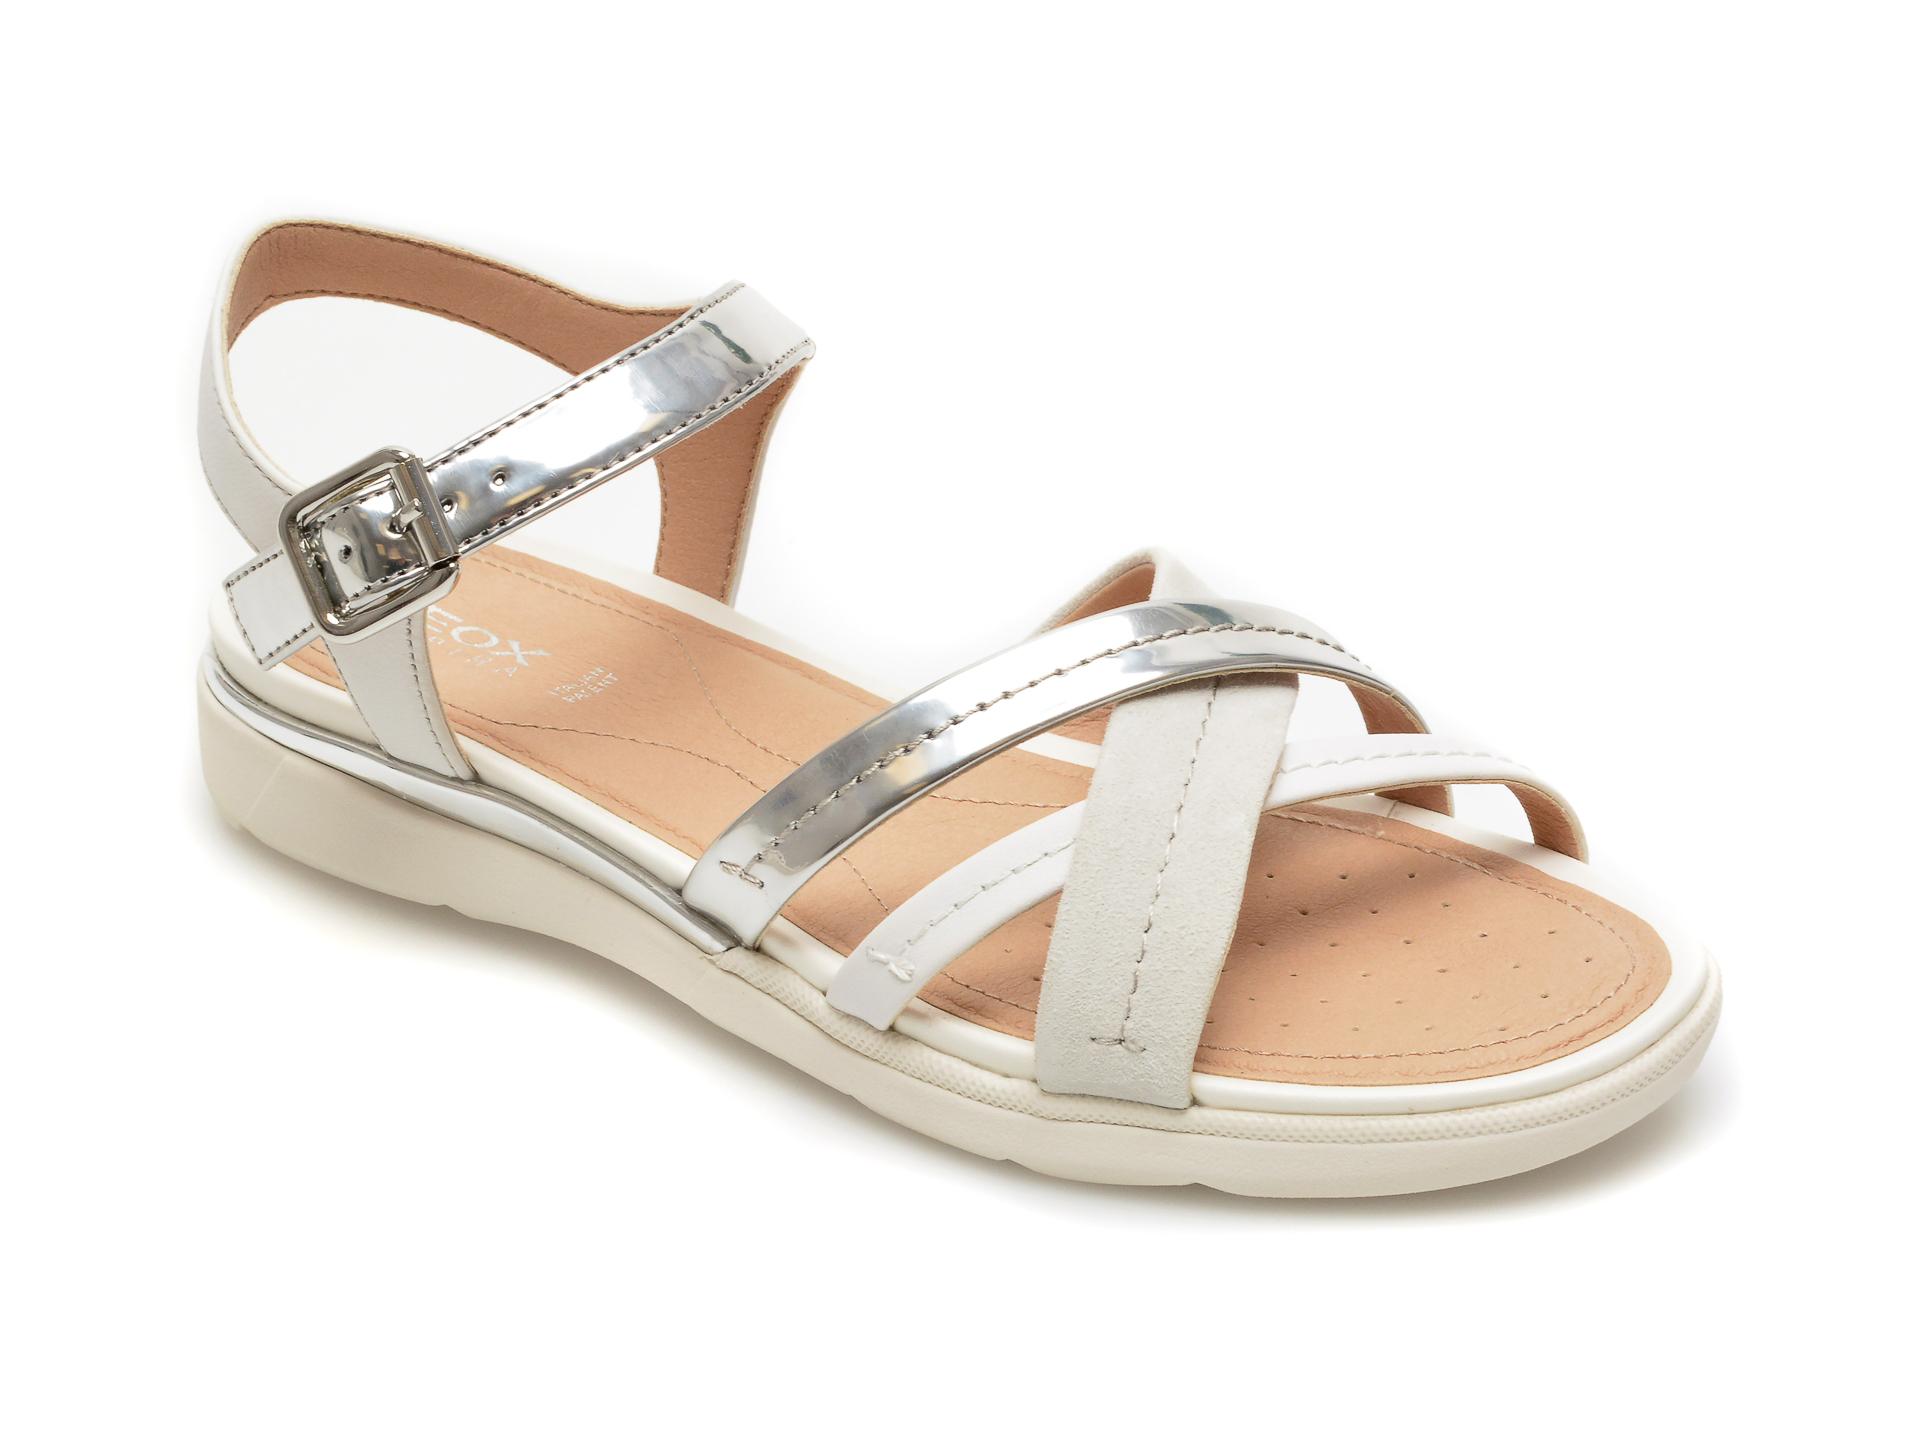 Sandale GEOX argintii, D02GZB, din piele naturala